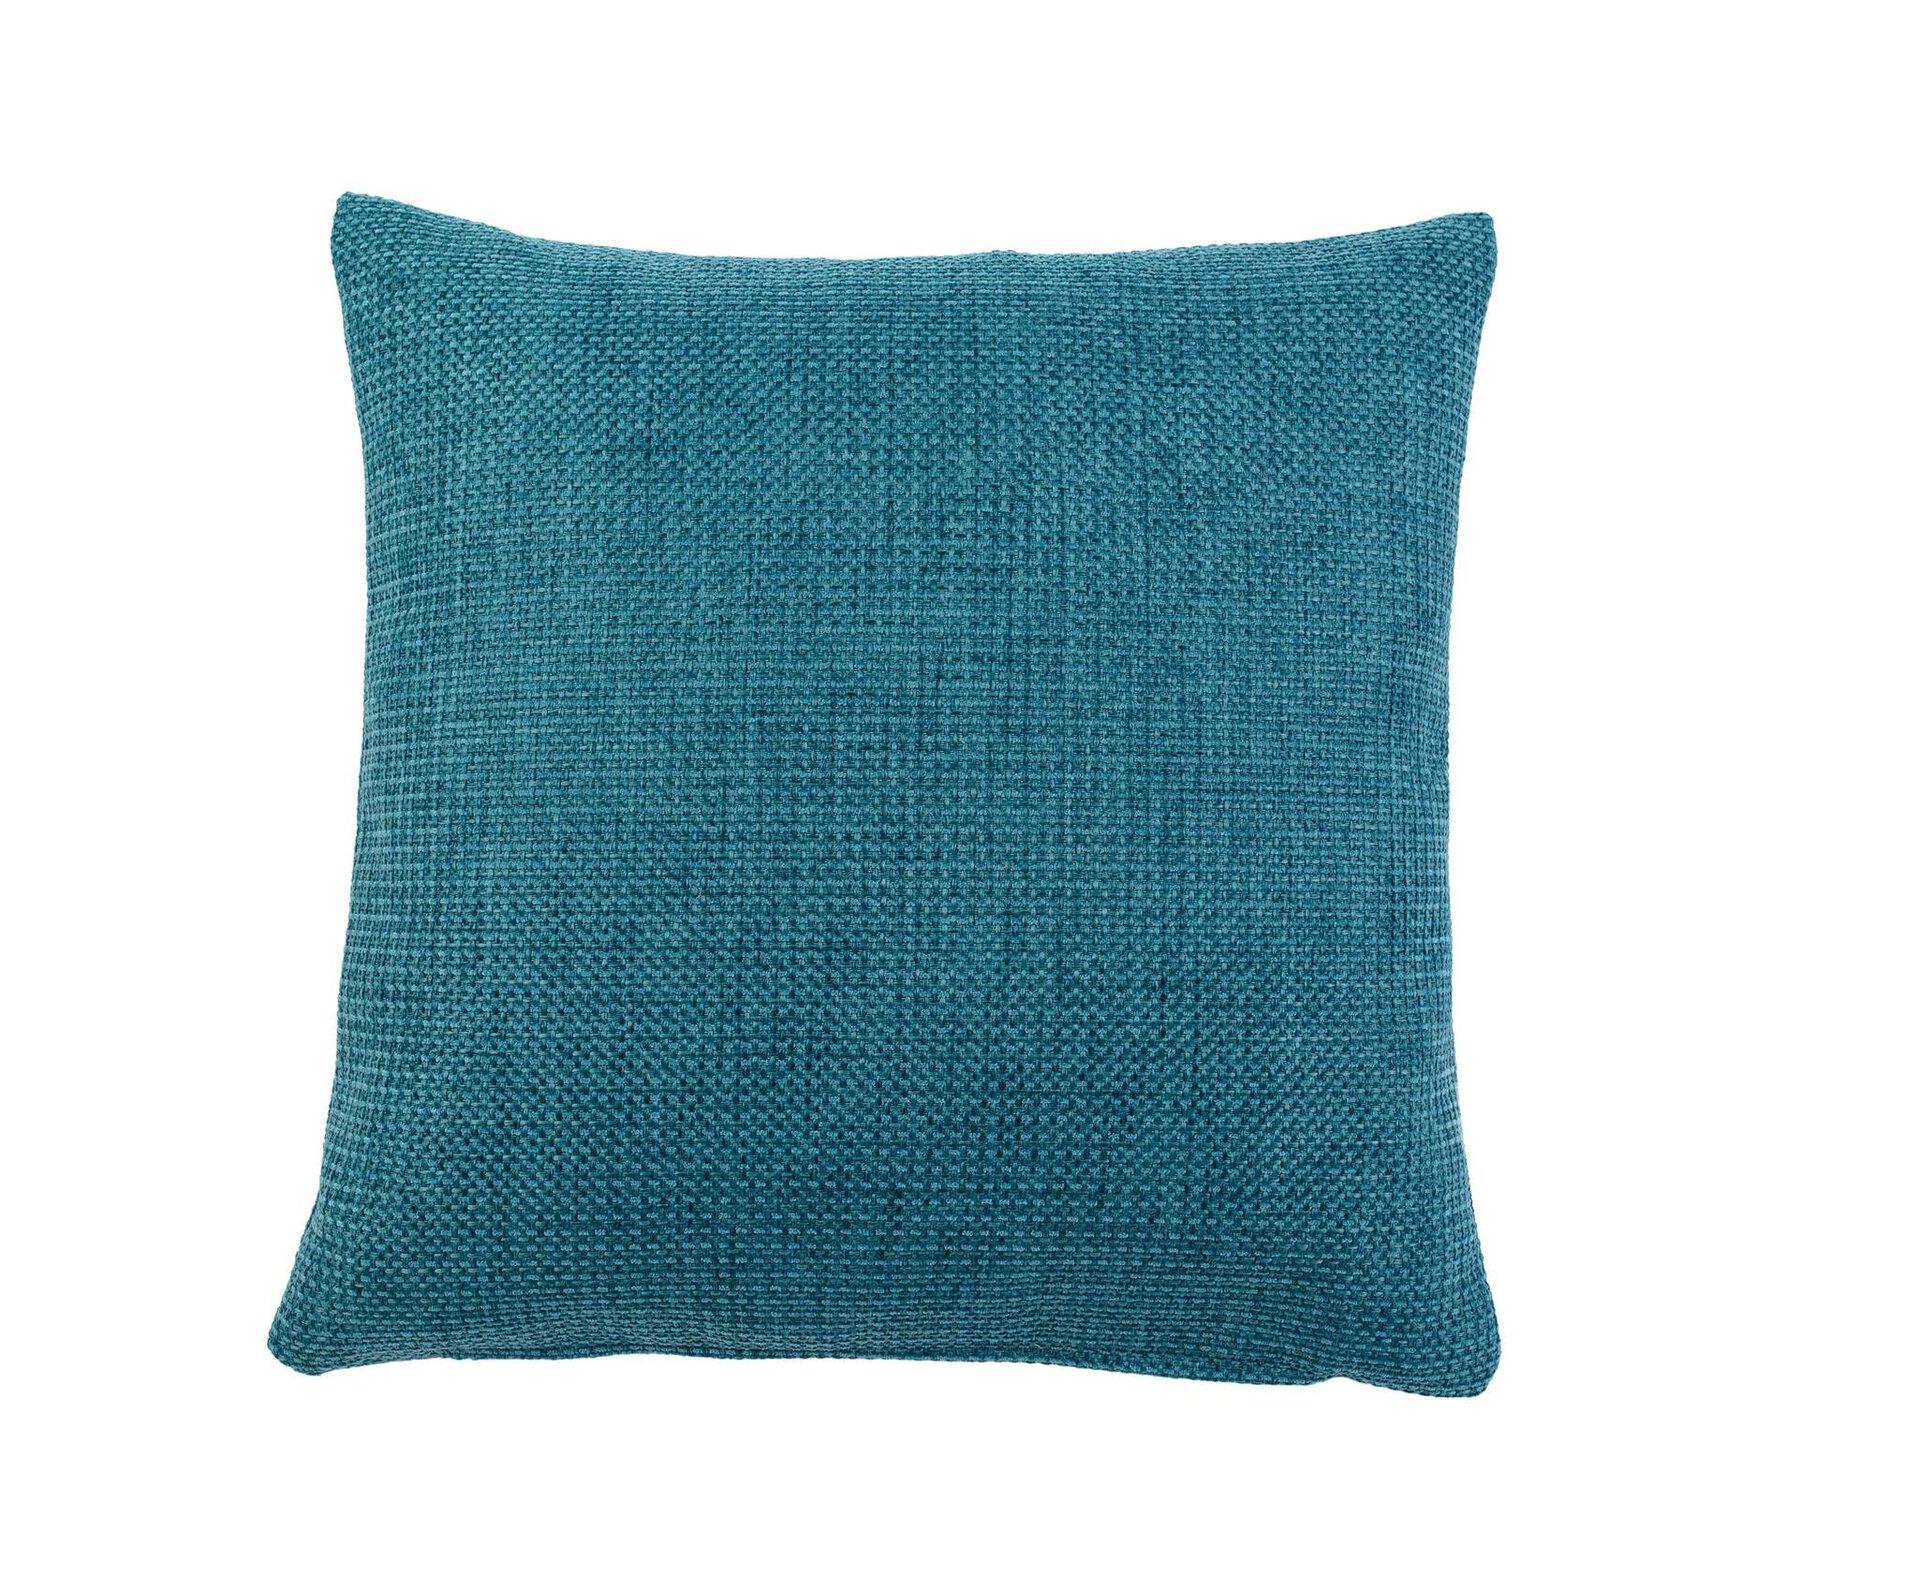 Kissenhülle Dallas Ambiente Trendlife Textil Blau 60 x 60 cm